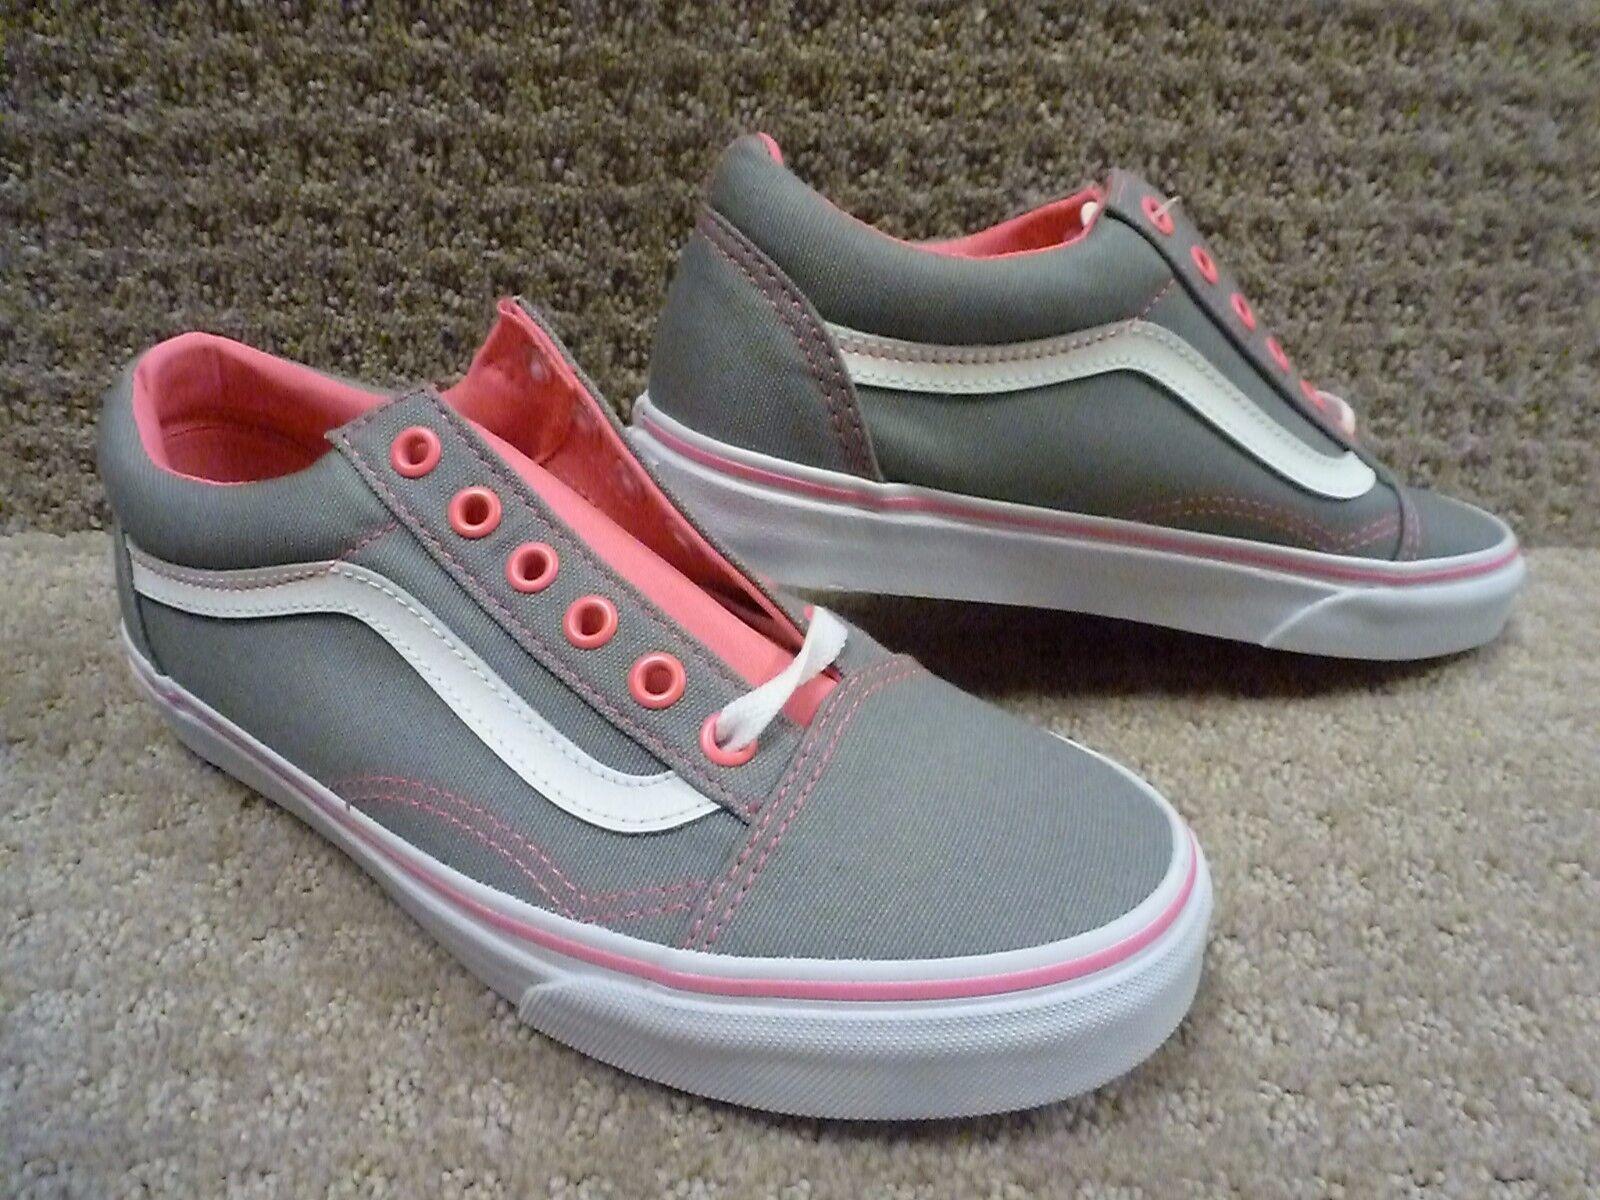 Vans Men's shoes  Old Skool  (Canvas) Frstgry NnPnkPop -Frost Grey Pink